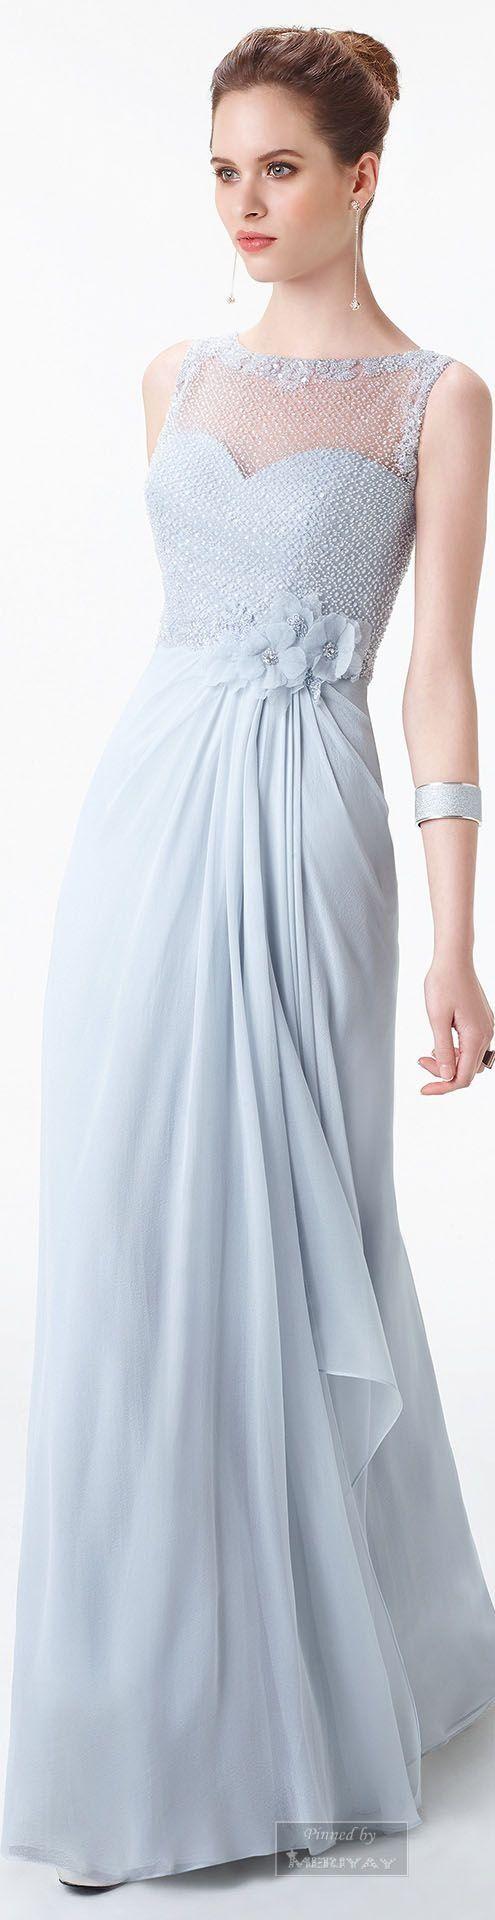 prom dress /prom-dresses-uk63_1